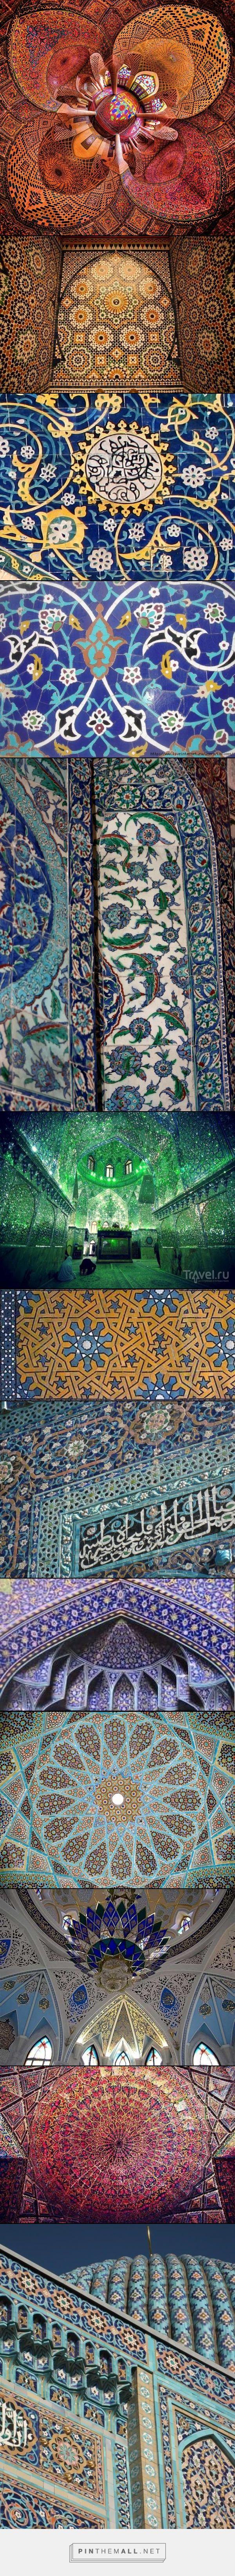 Ислам. Мозаики в мечетях.- created via http://pinthemall.net